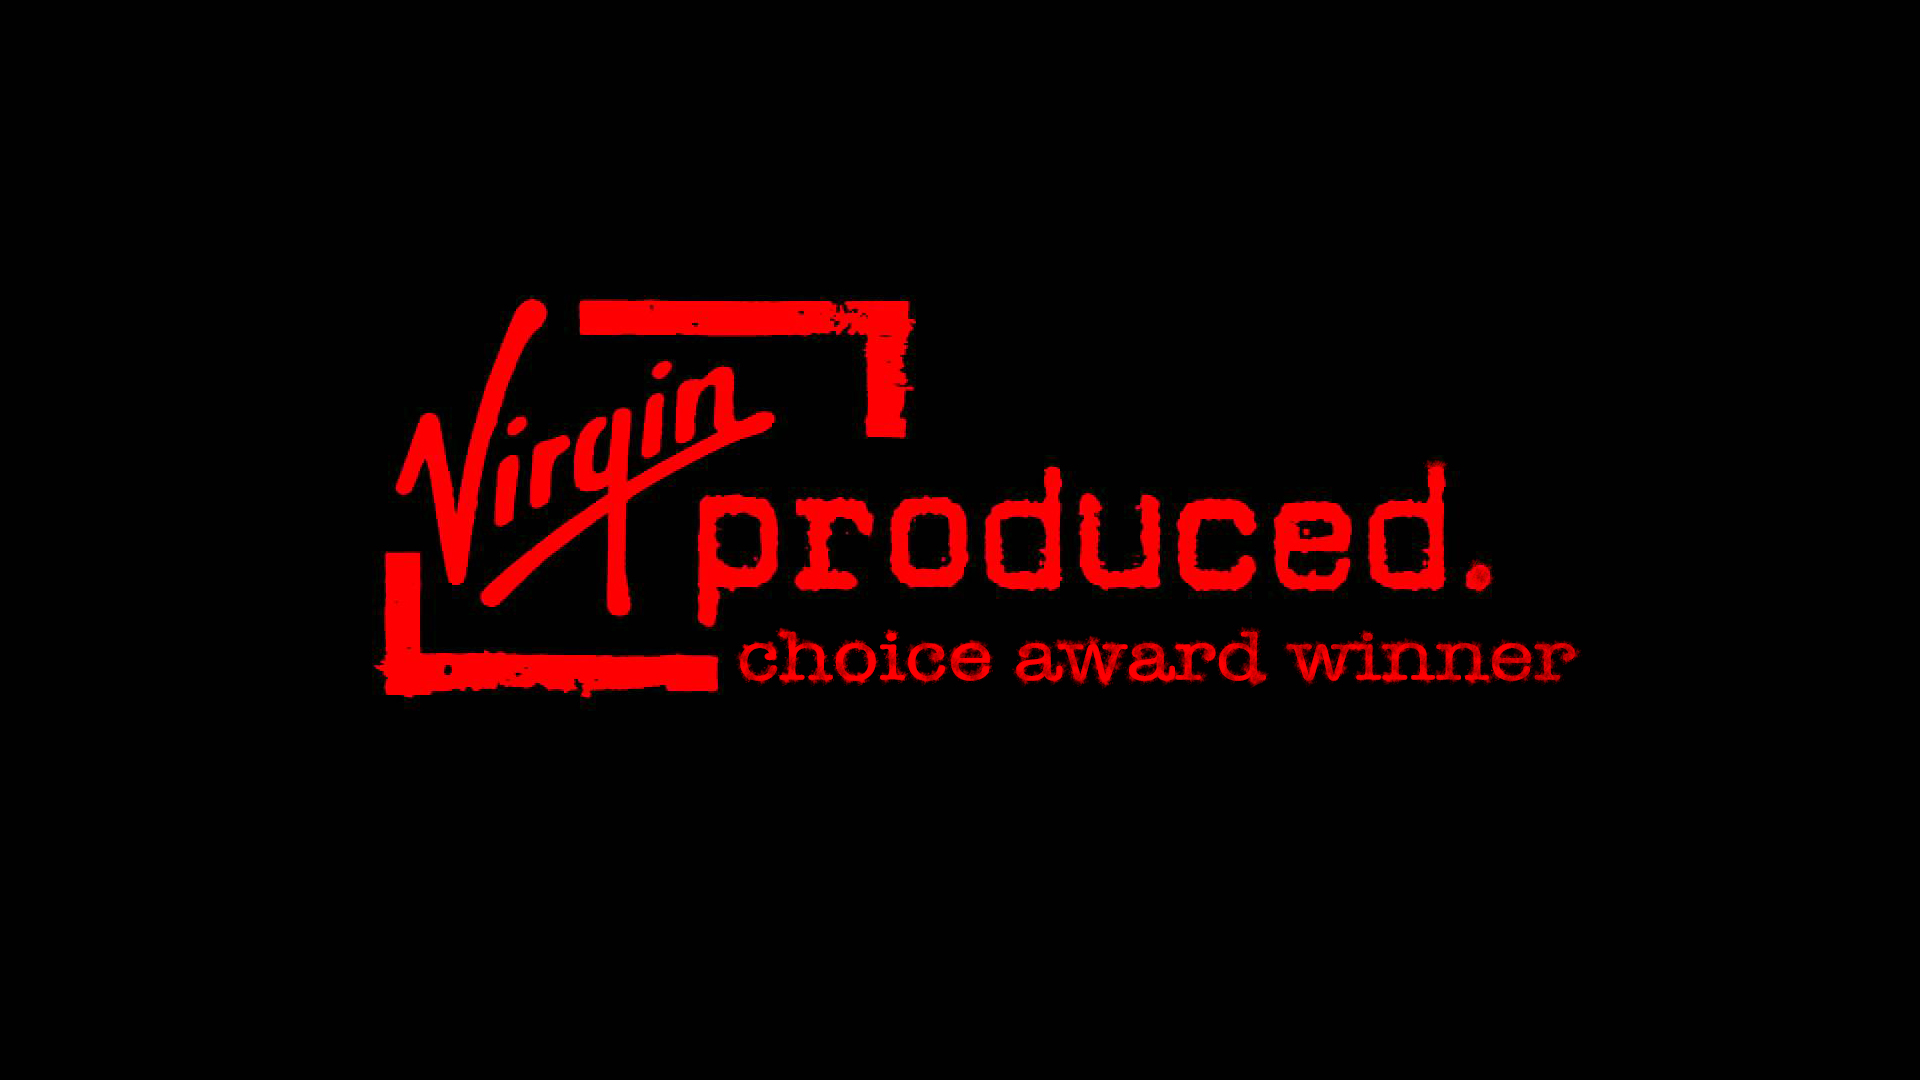 VirginProduced